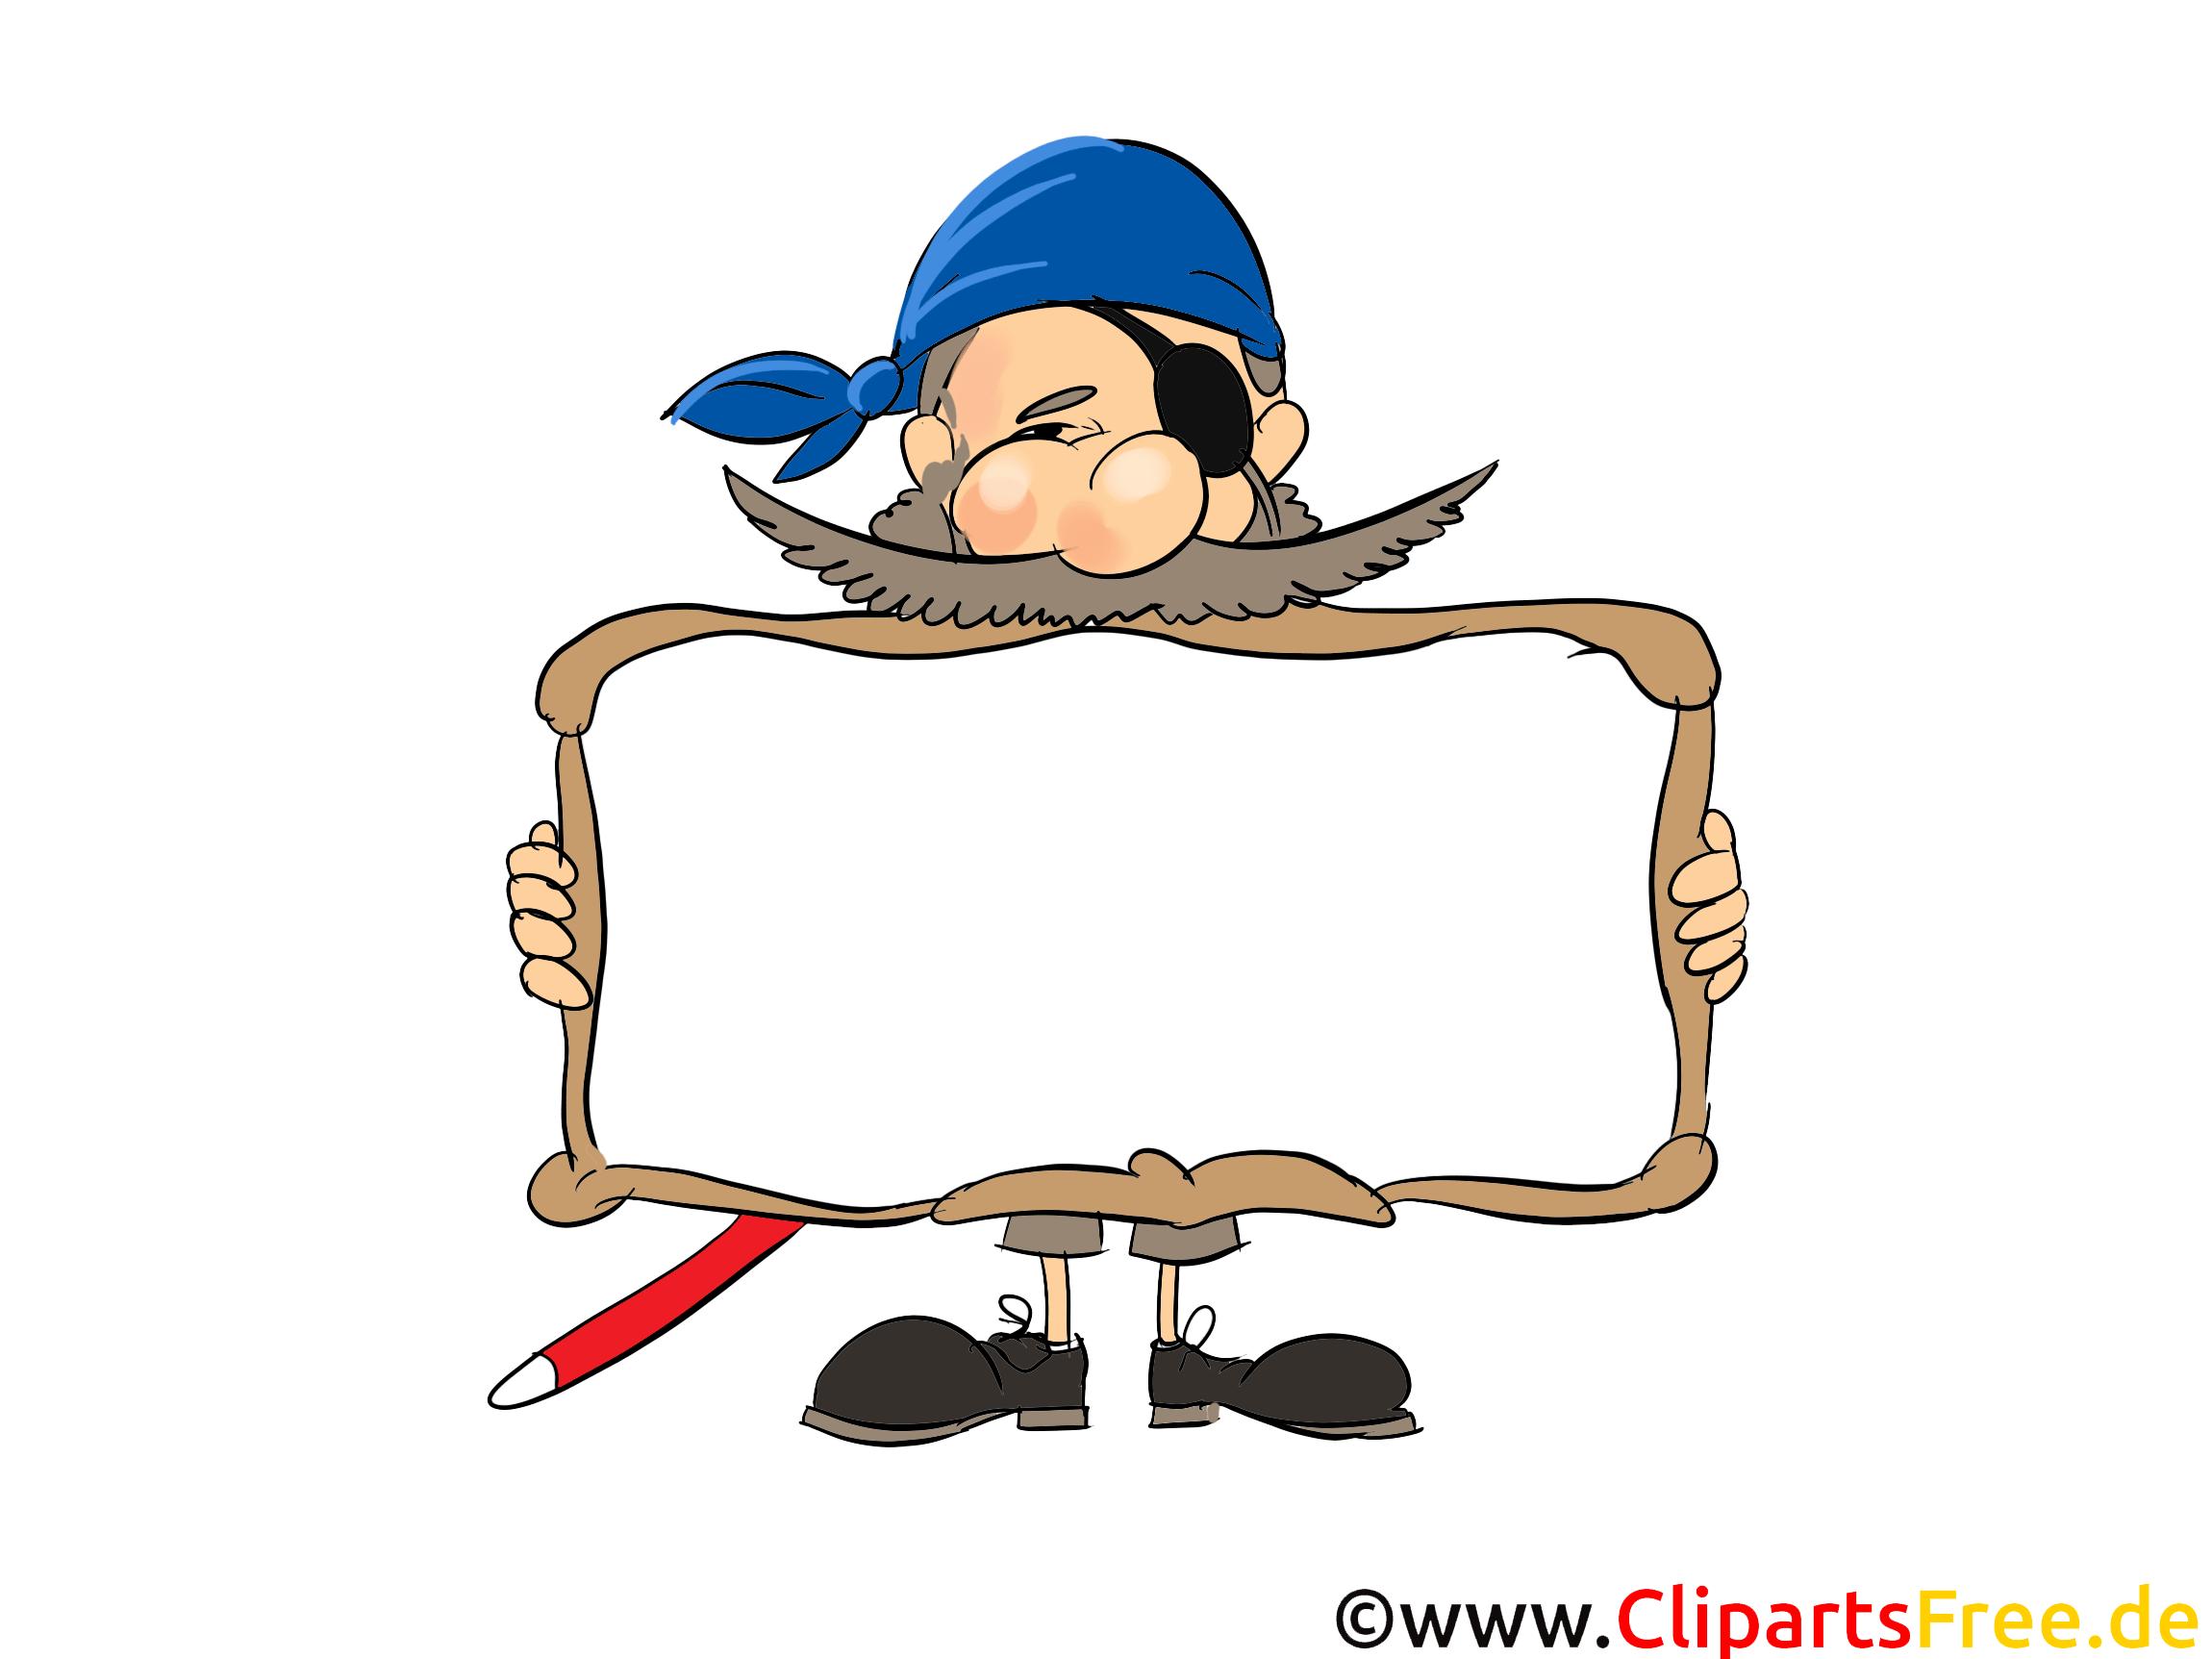 Pirat mit Rahmen zum Beschriften Bild Clipart Grafik